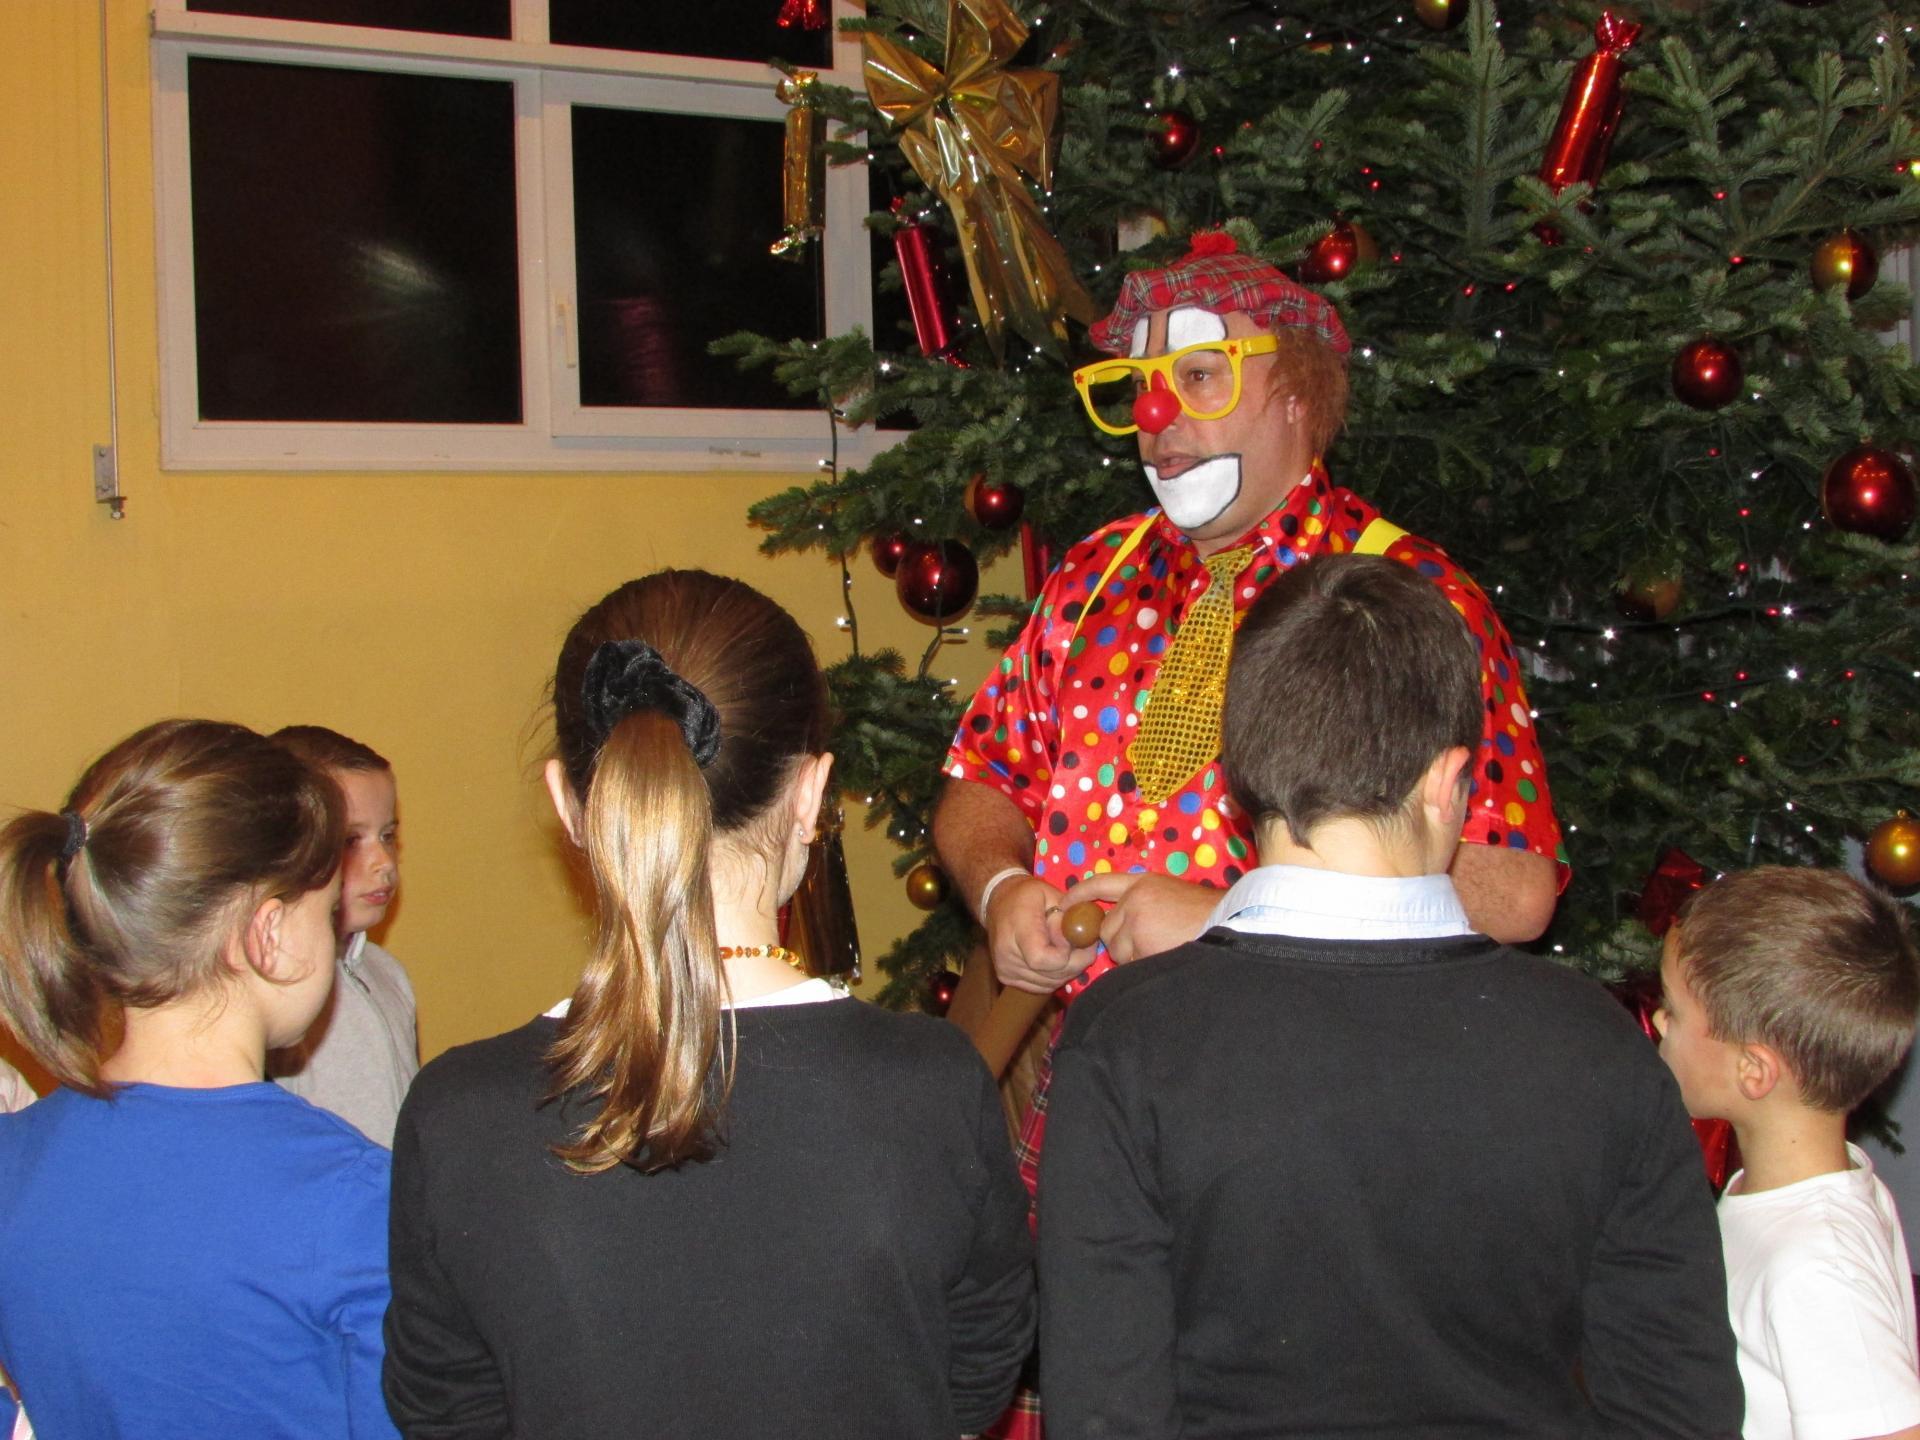 Tonton le clown sculpture ballons  Arbre de Noël